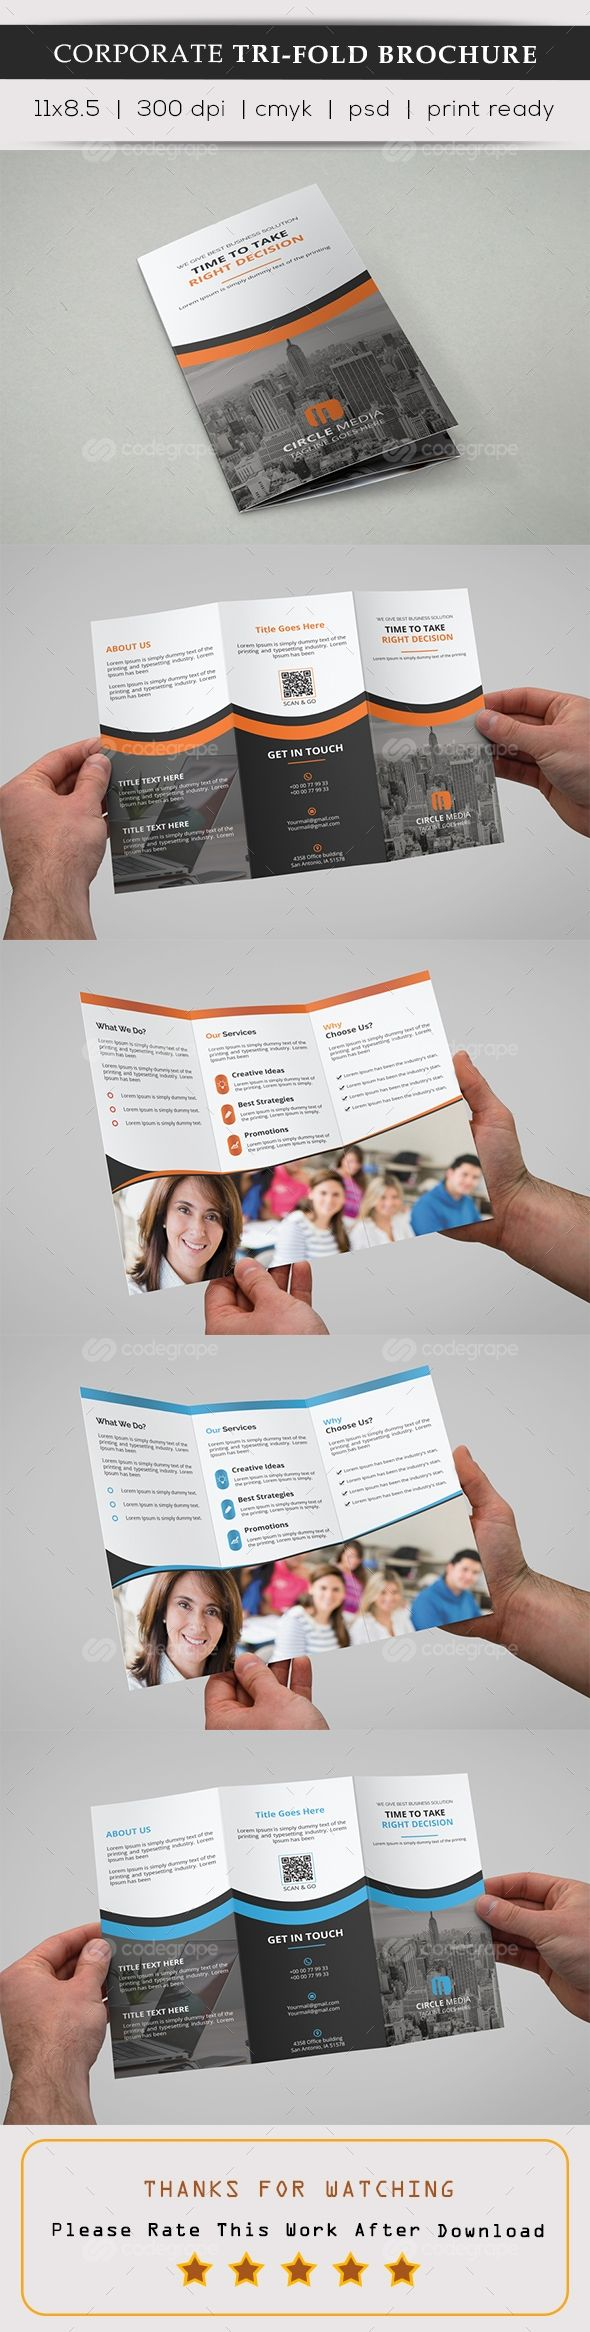 Tri-Fold Brochure on @codegrape. More Info: https://www.codegrape.com/item/tri-fold-brochure/11640